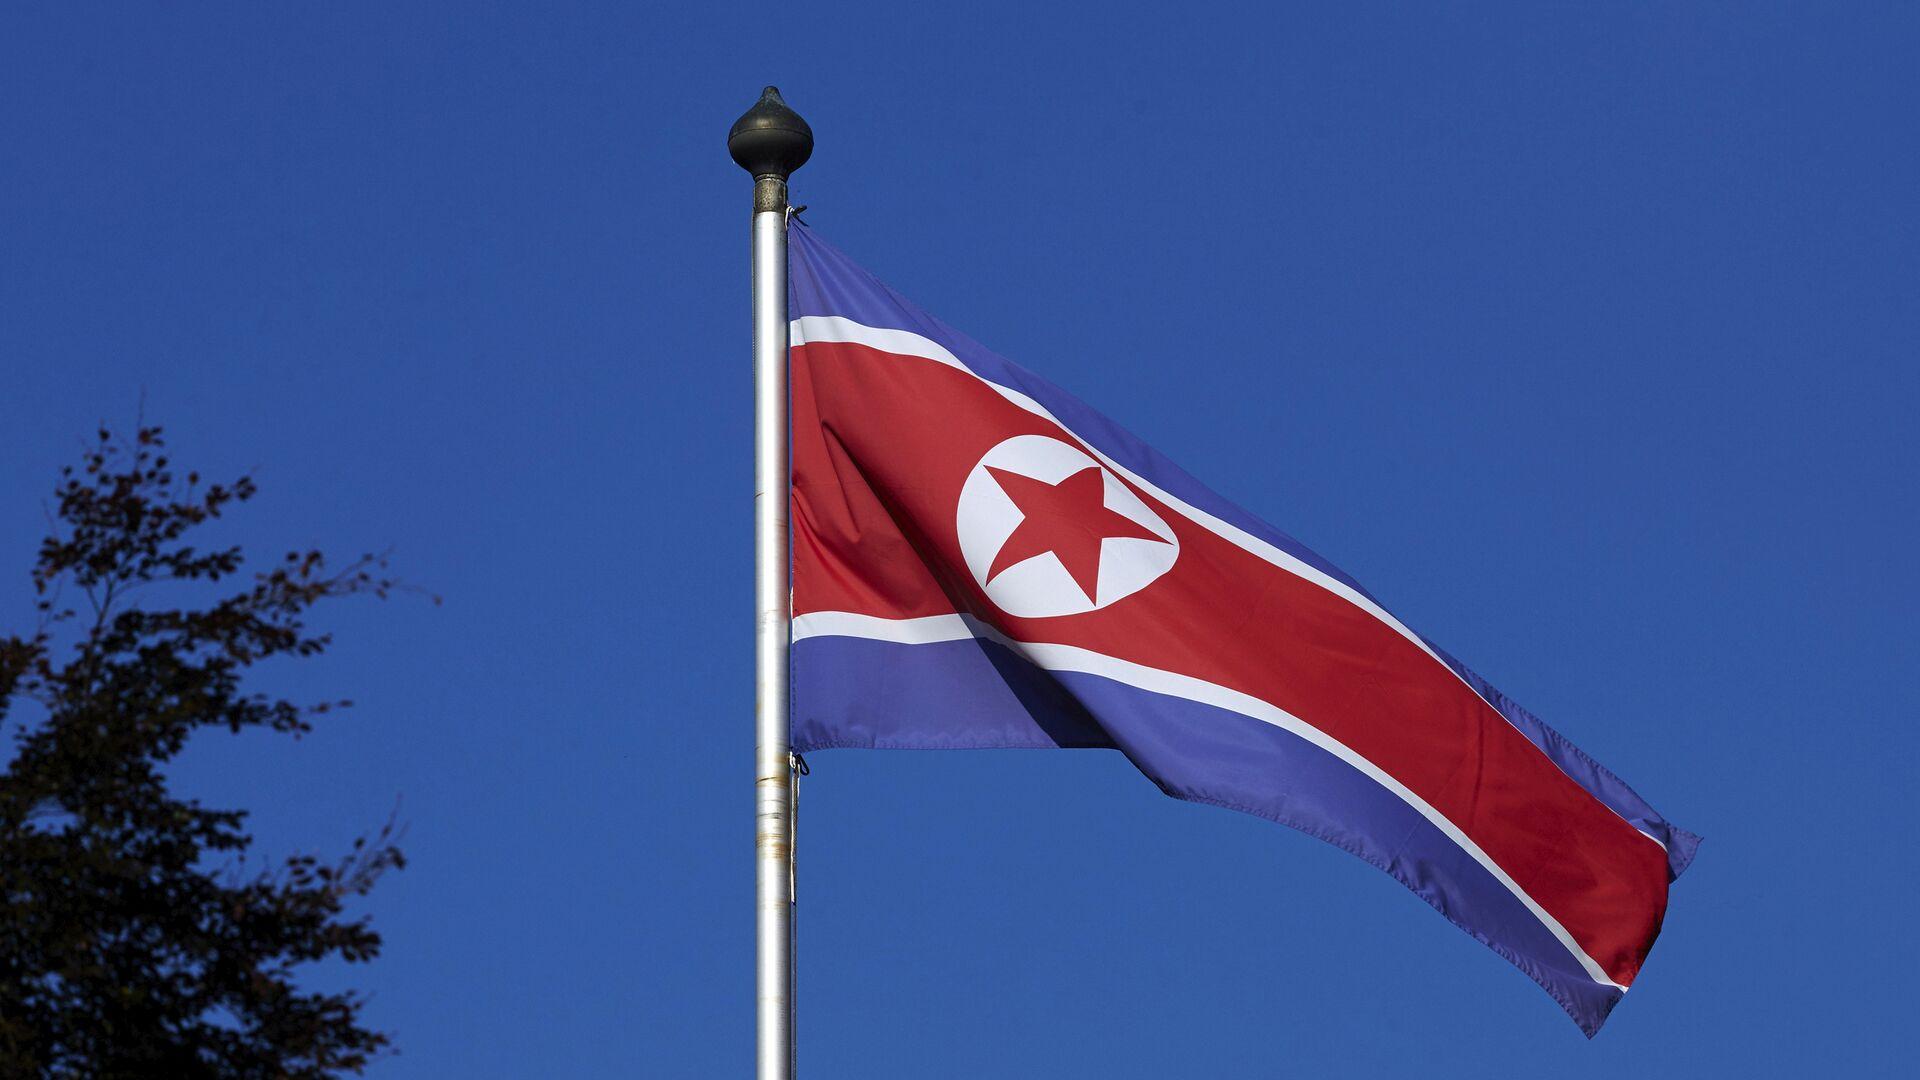 Bandera de Corea del Norte - Sputnik Mundo, 1920, 20.09.2021